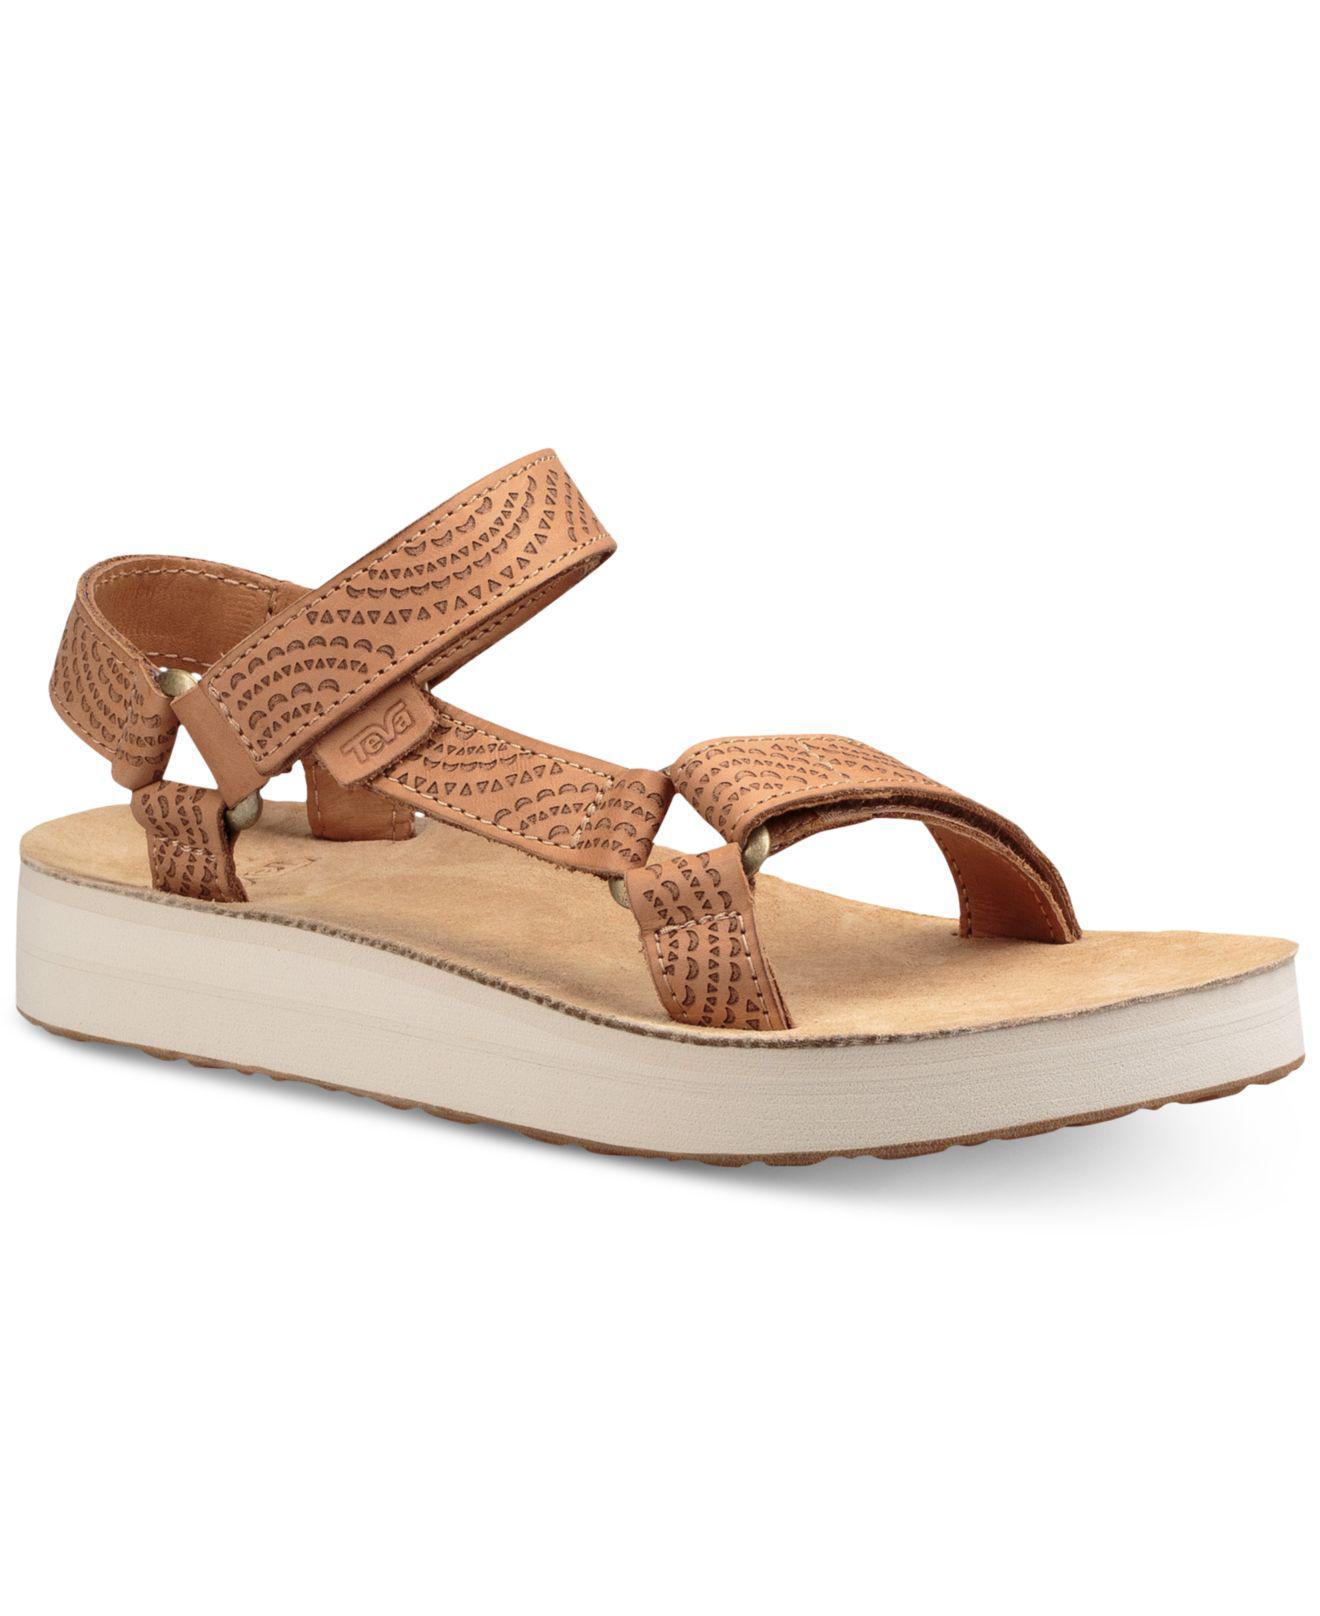 Outlet Best Free Shipping Cheap Price Teva Flip Premier Sandal(Women's) -Beach Break Desert Sage Textile Choice For Sale 2018 New Online Buy Cheap Shop For YejVLZNNe